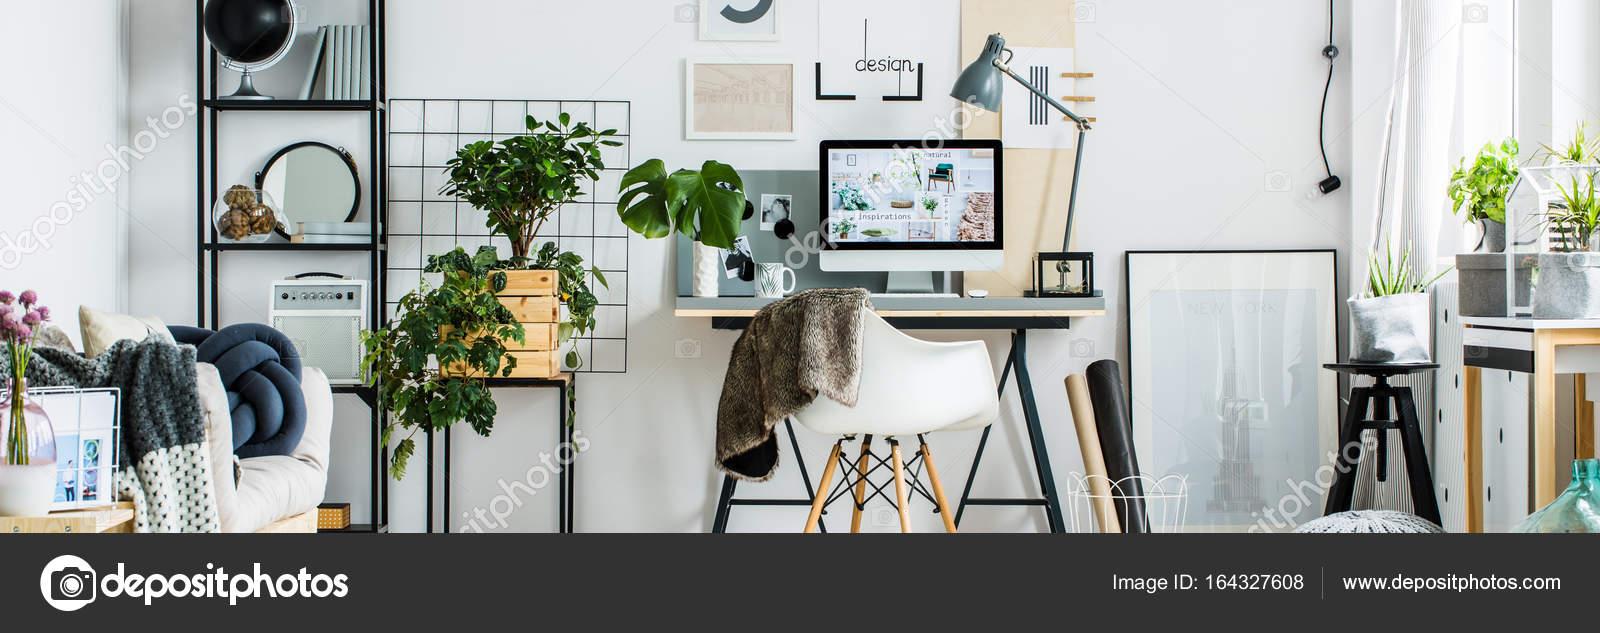 Interior De Oficina Con Muebles Modernos Foto De Stock